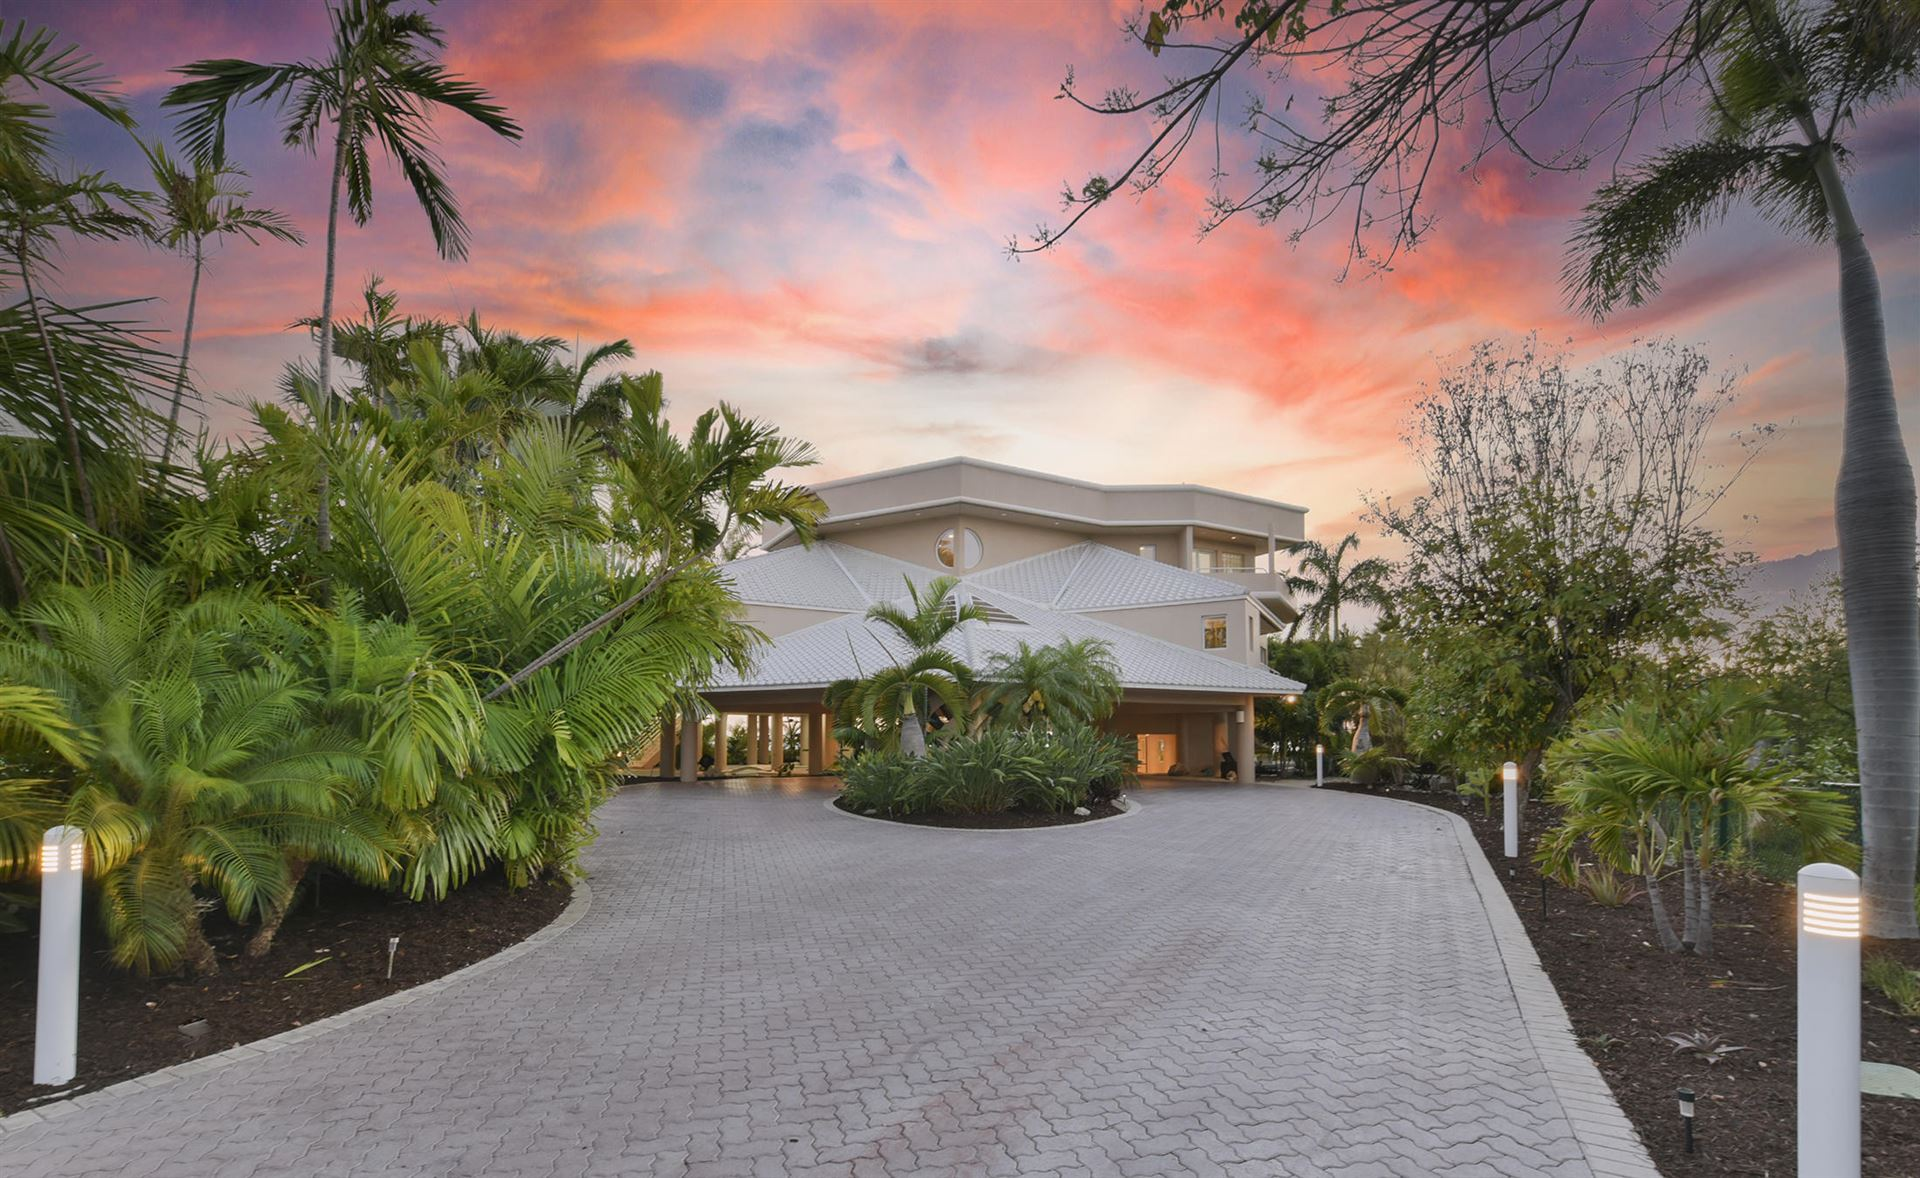 29550 W Cahill Court, Big Pine, FL 33043 - #: 595724